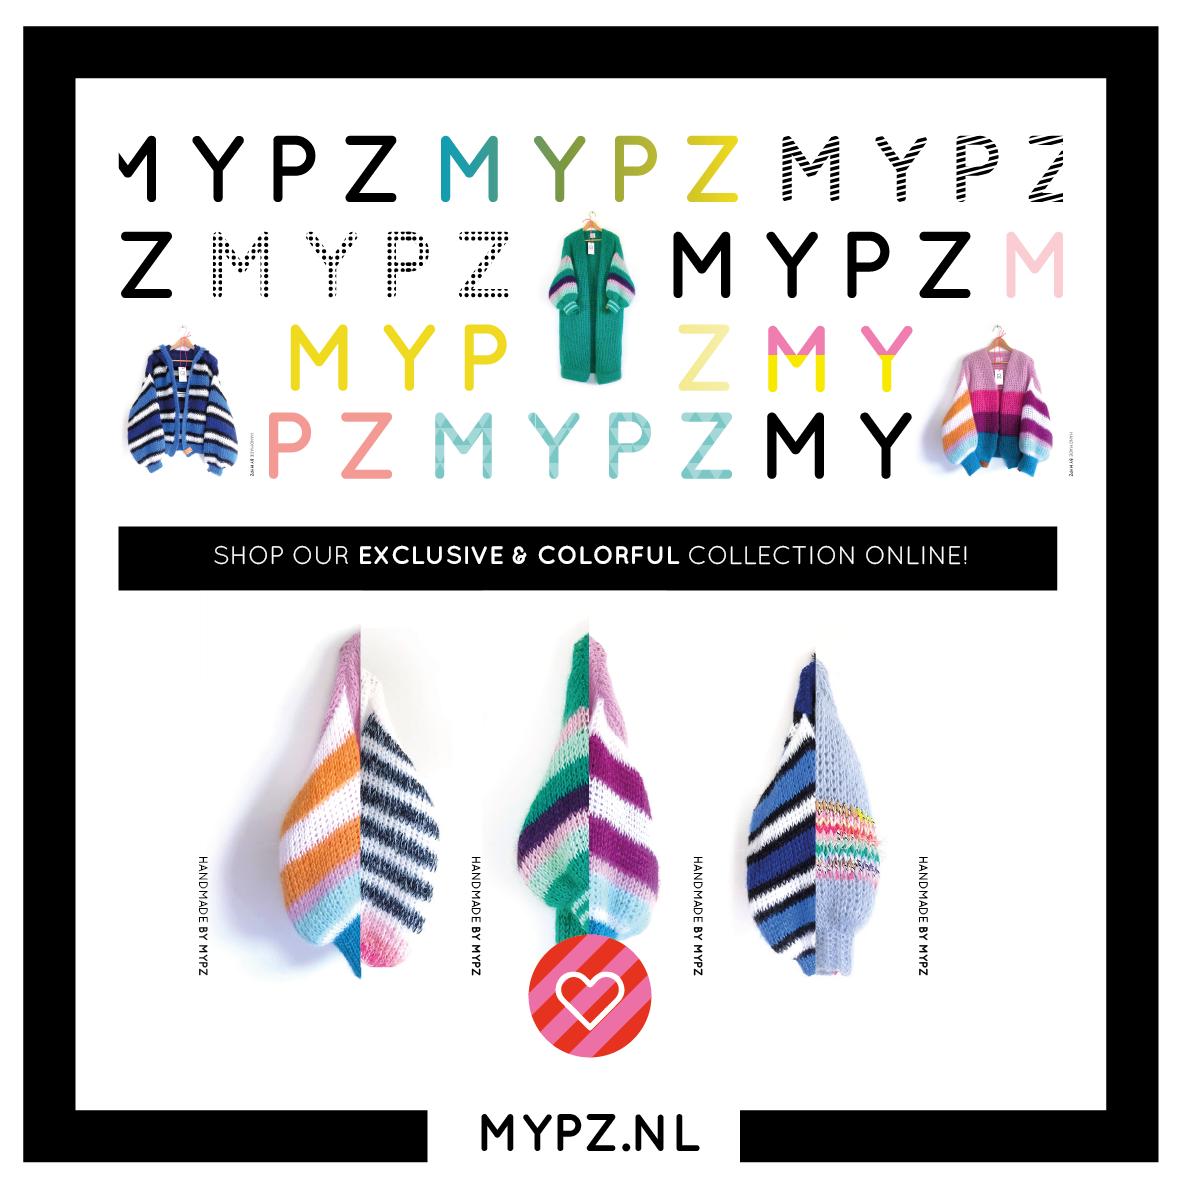 MYPZ mohair cardigans